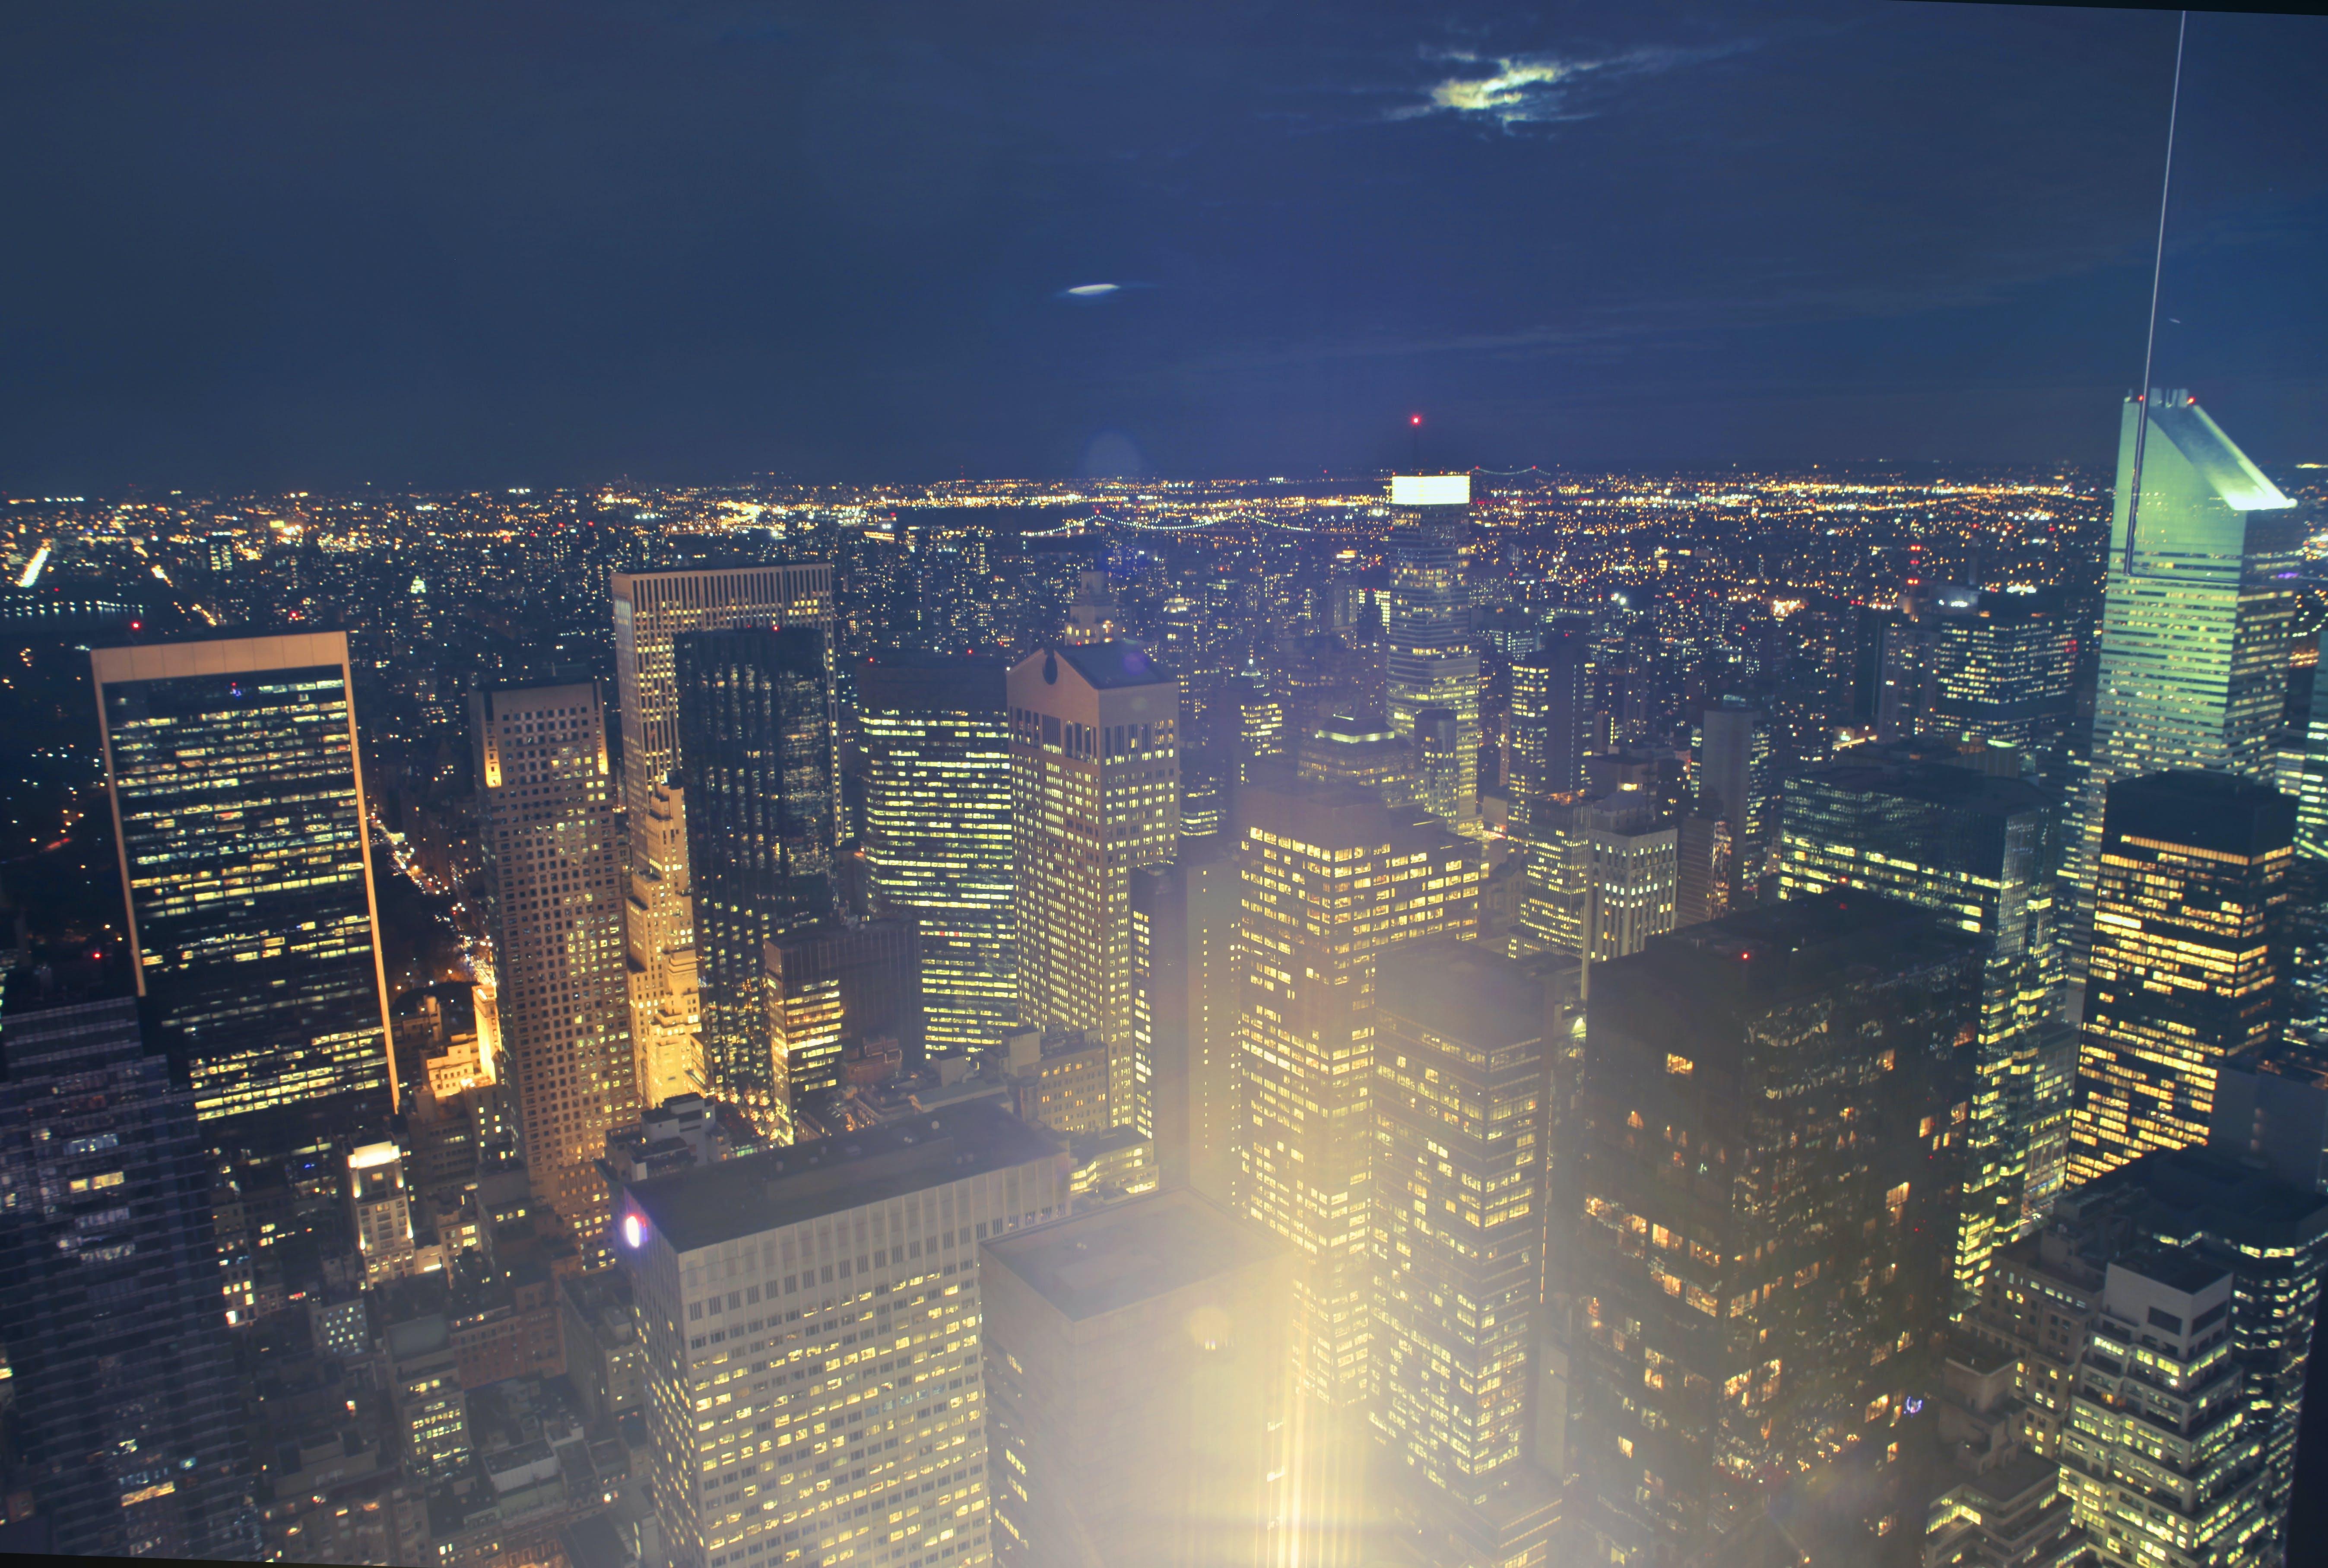 City Building Lights